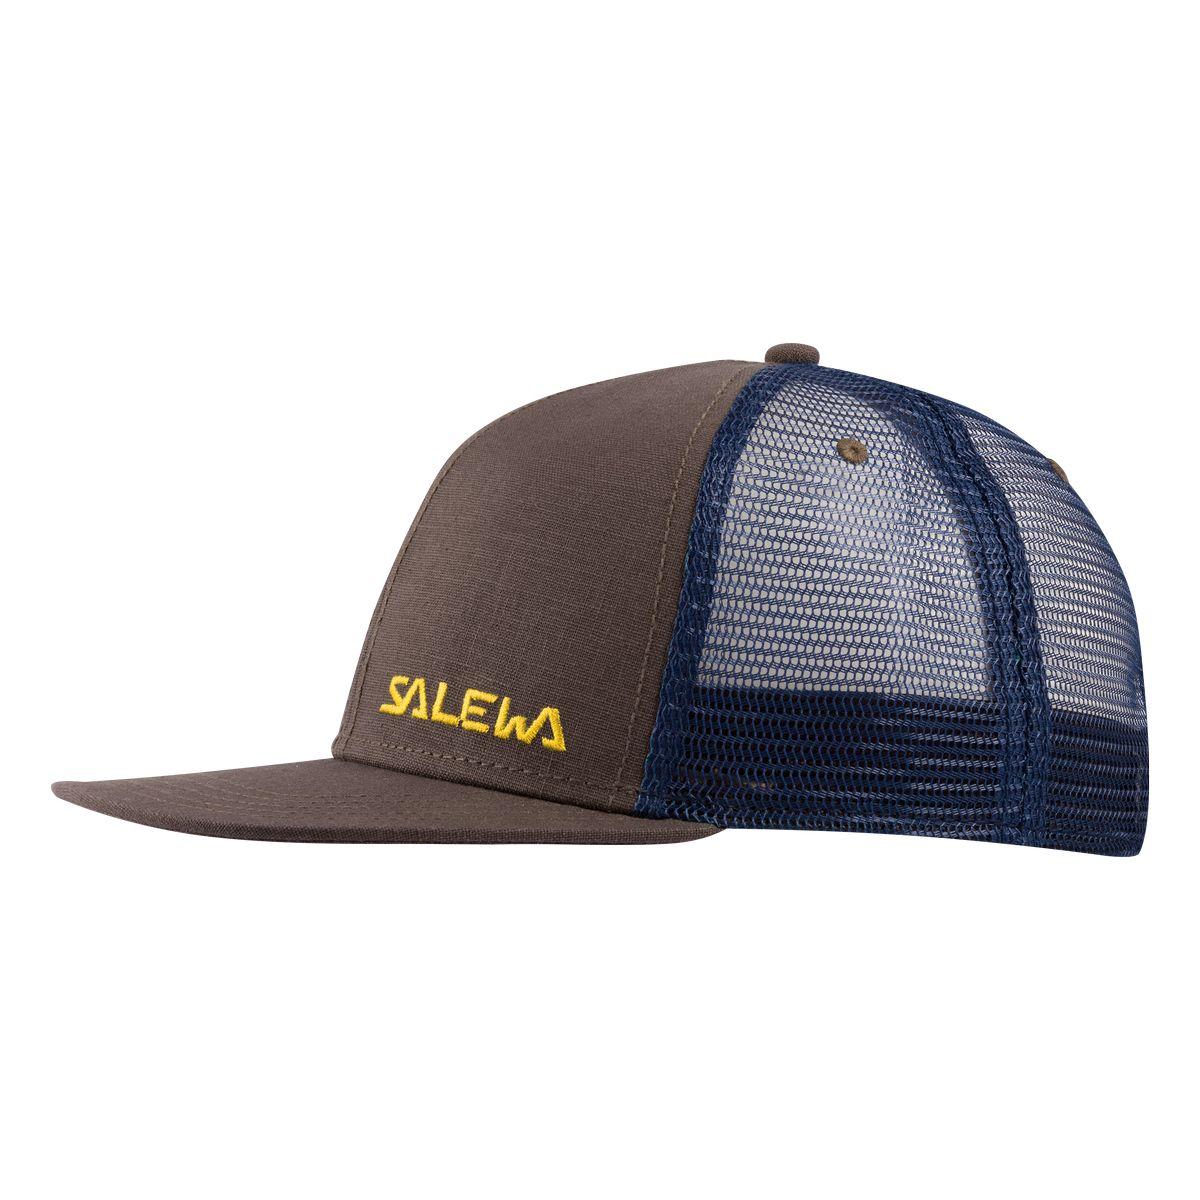 Бейсболка Salewa 2016 FREA (CLIMB) BASECAP walnut/2070